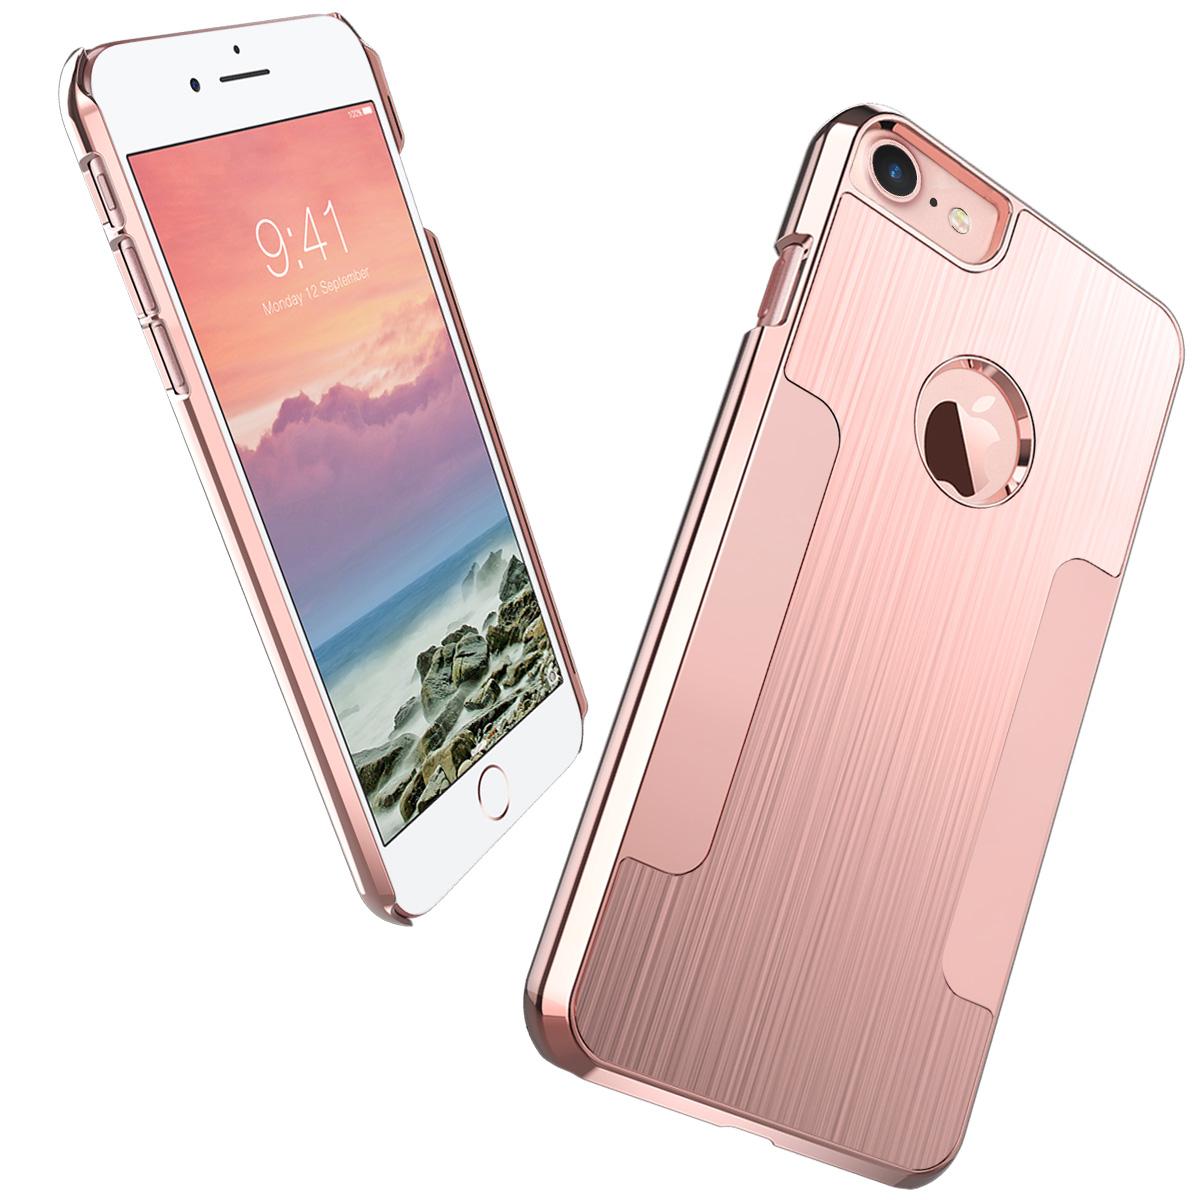 iPhone 7 Case, ULAK Slim Brushed Aluminum Chrome Coating Hard Case With PC Cover for iPhone 7 4.7 inch 2016